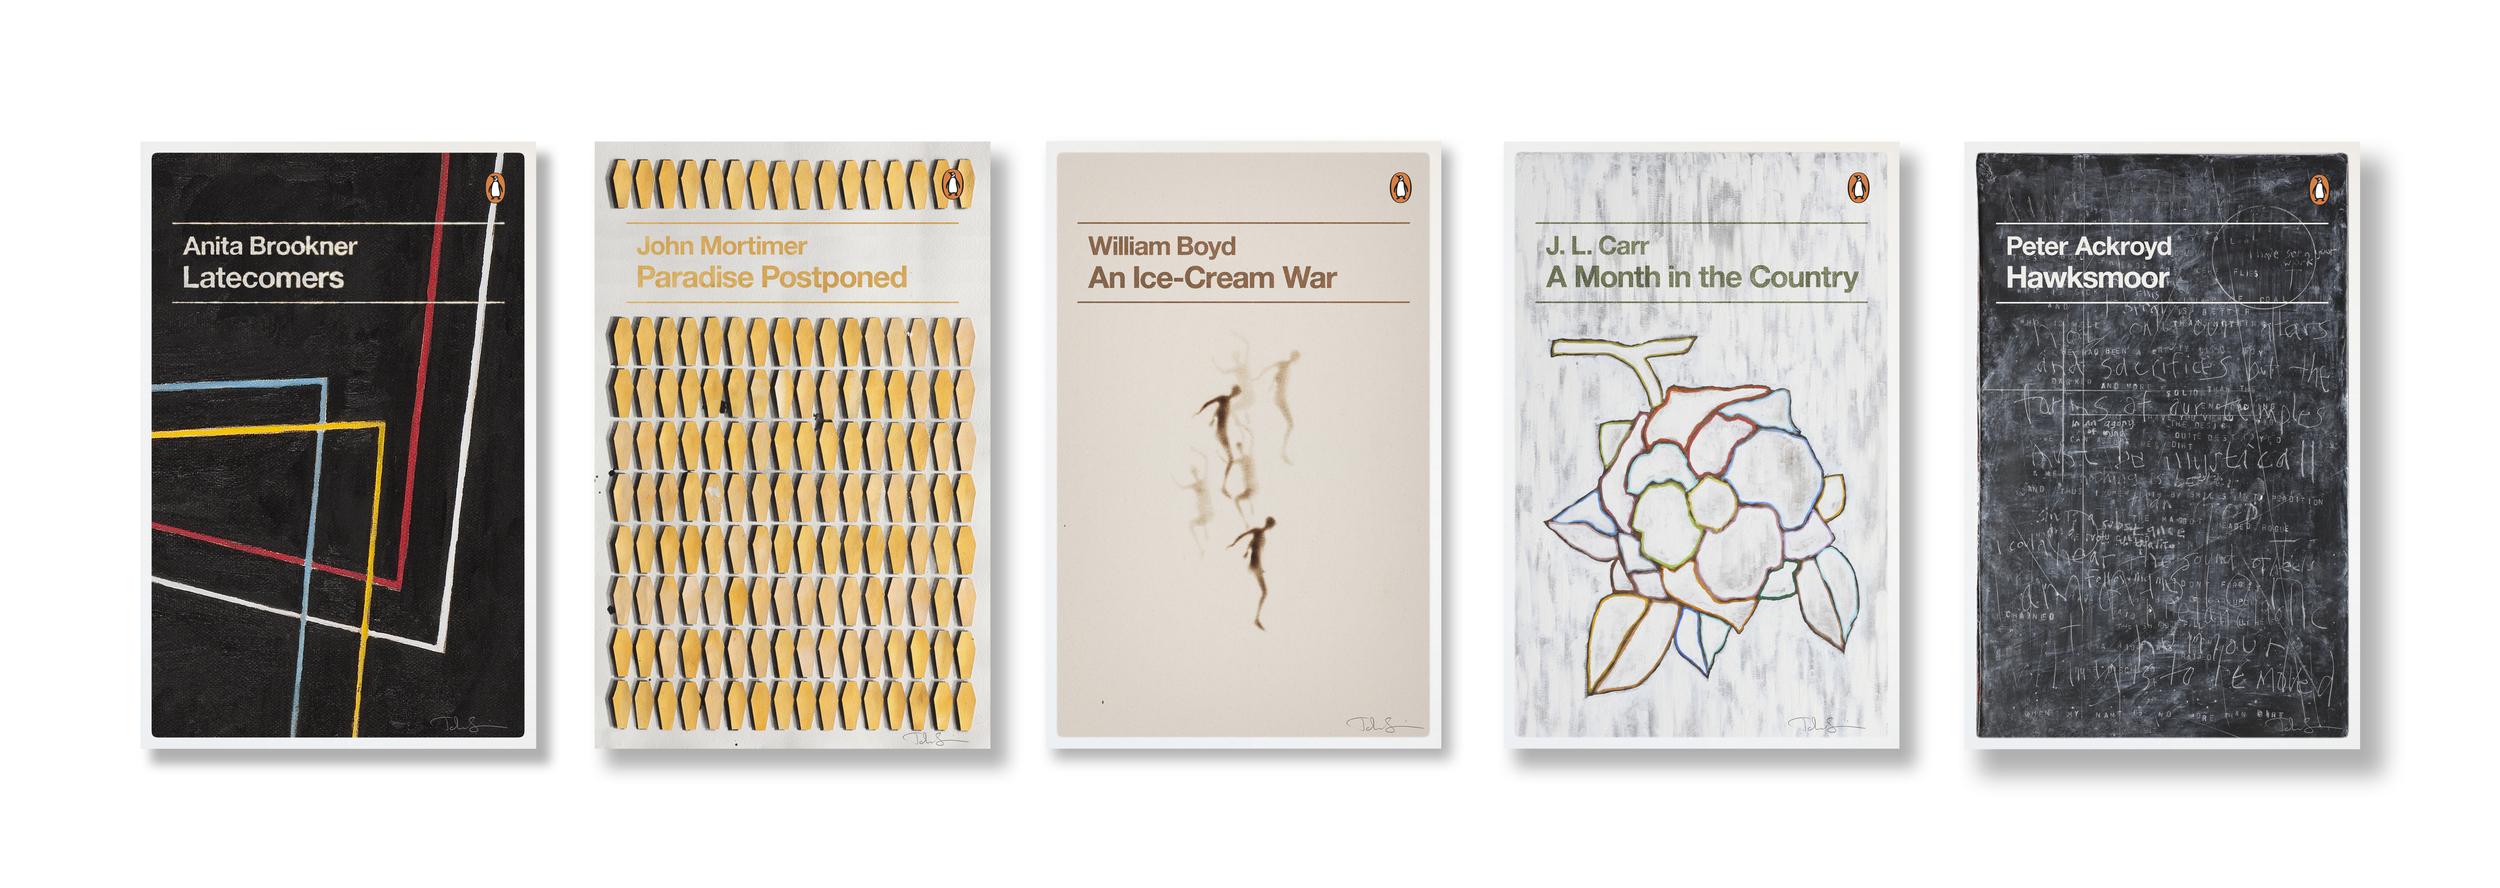 Penguin Decades series - Art: John Squire Design: Jim Stoddart